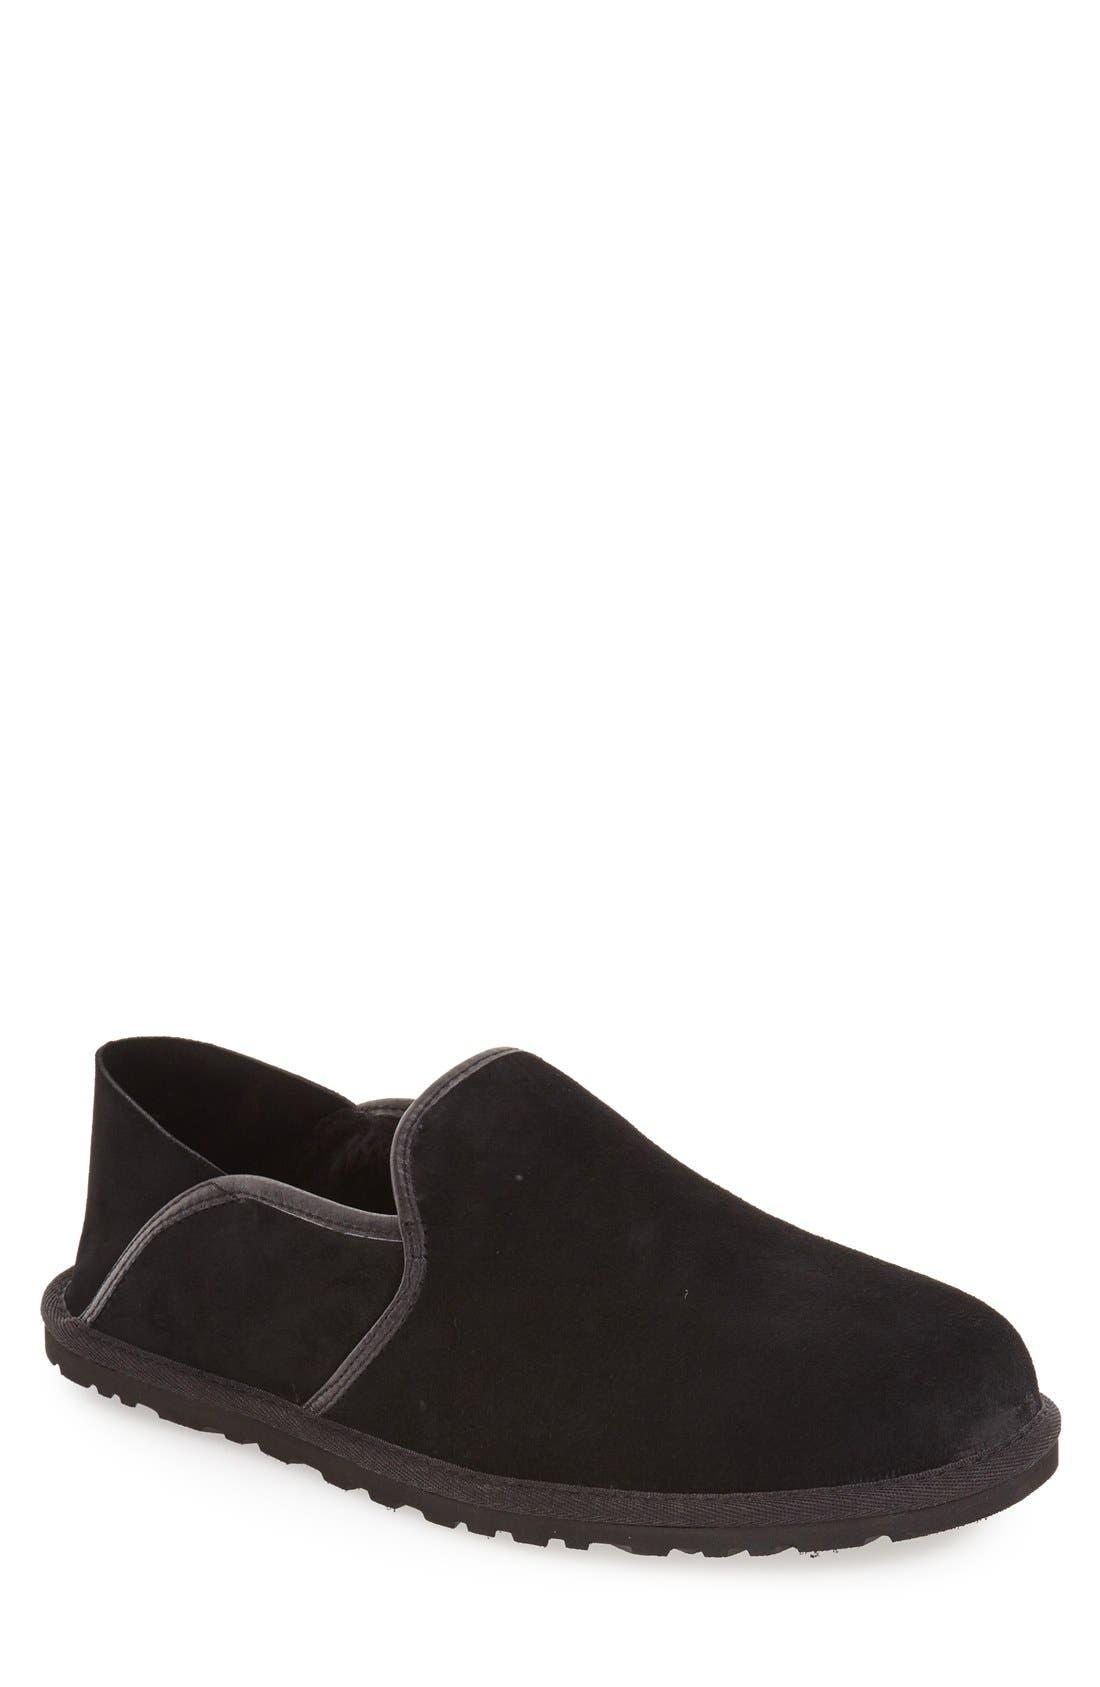 Cooke Slipper,                         Main,                         color, Black